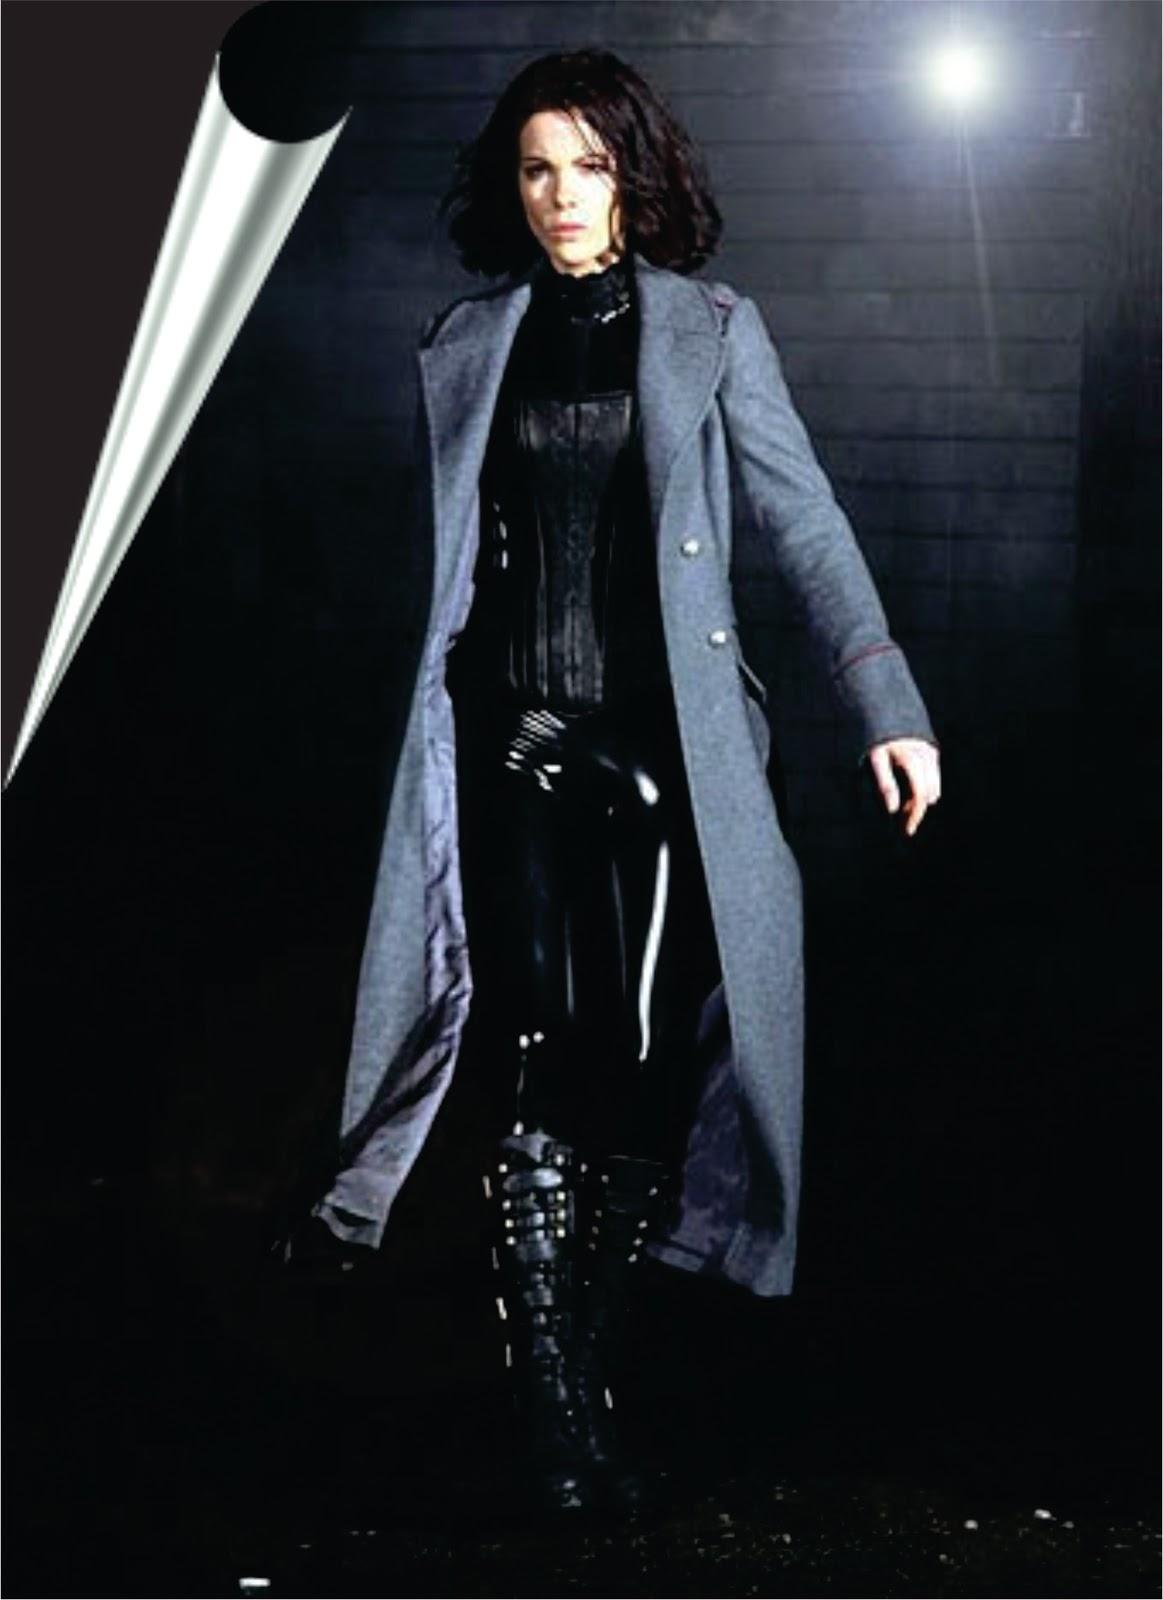 http://2.bp.blogspot.com/-2pgGRNMxk8o/TvGdKP7SLNI/AAAAAAAAHFY/sIJ1dTBZ4mE/s1600/Kate+Beckinsale+Underworld+4+%25281%2529.jpg